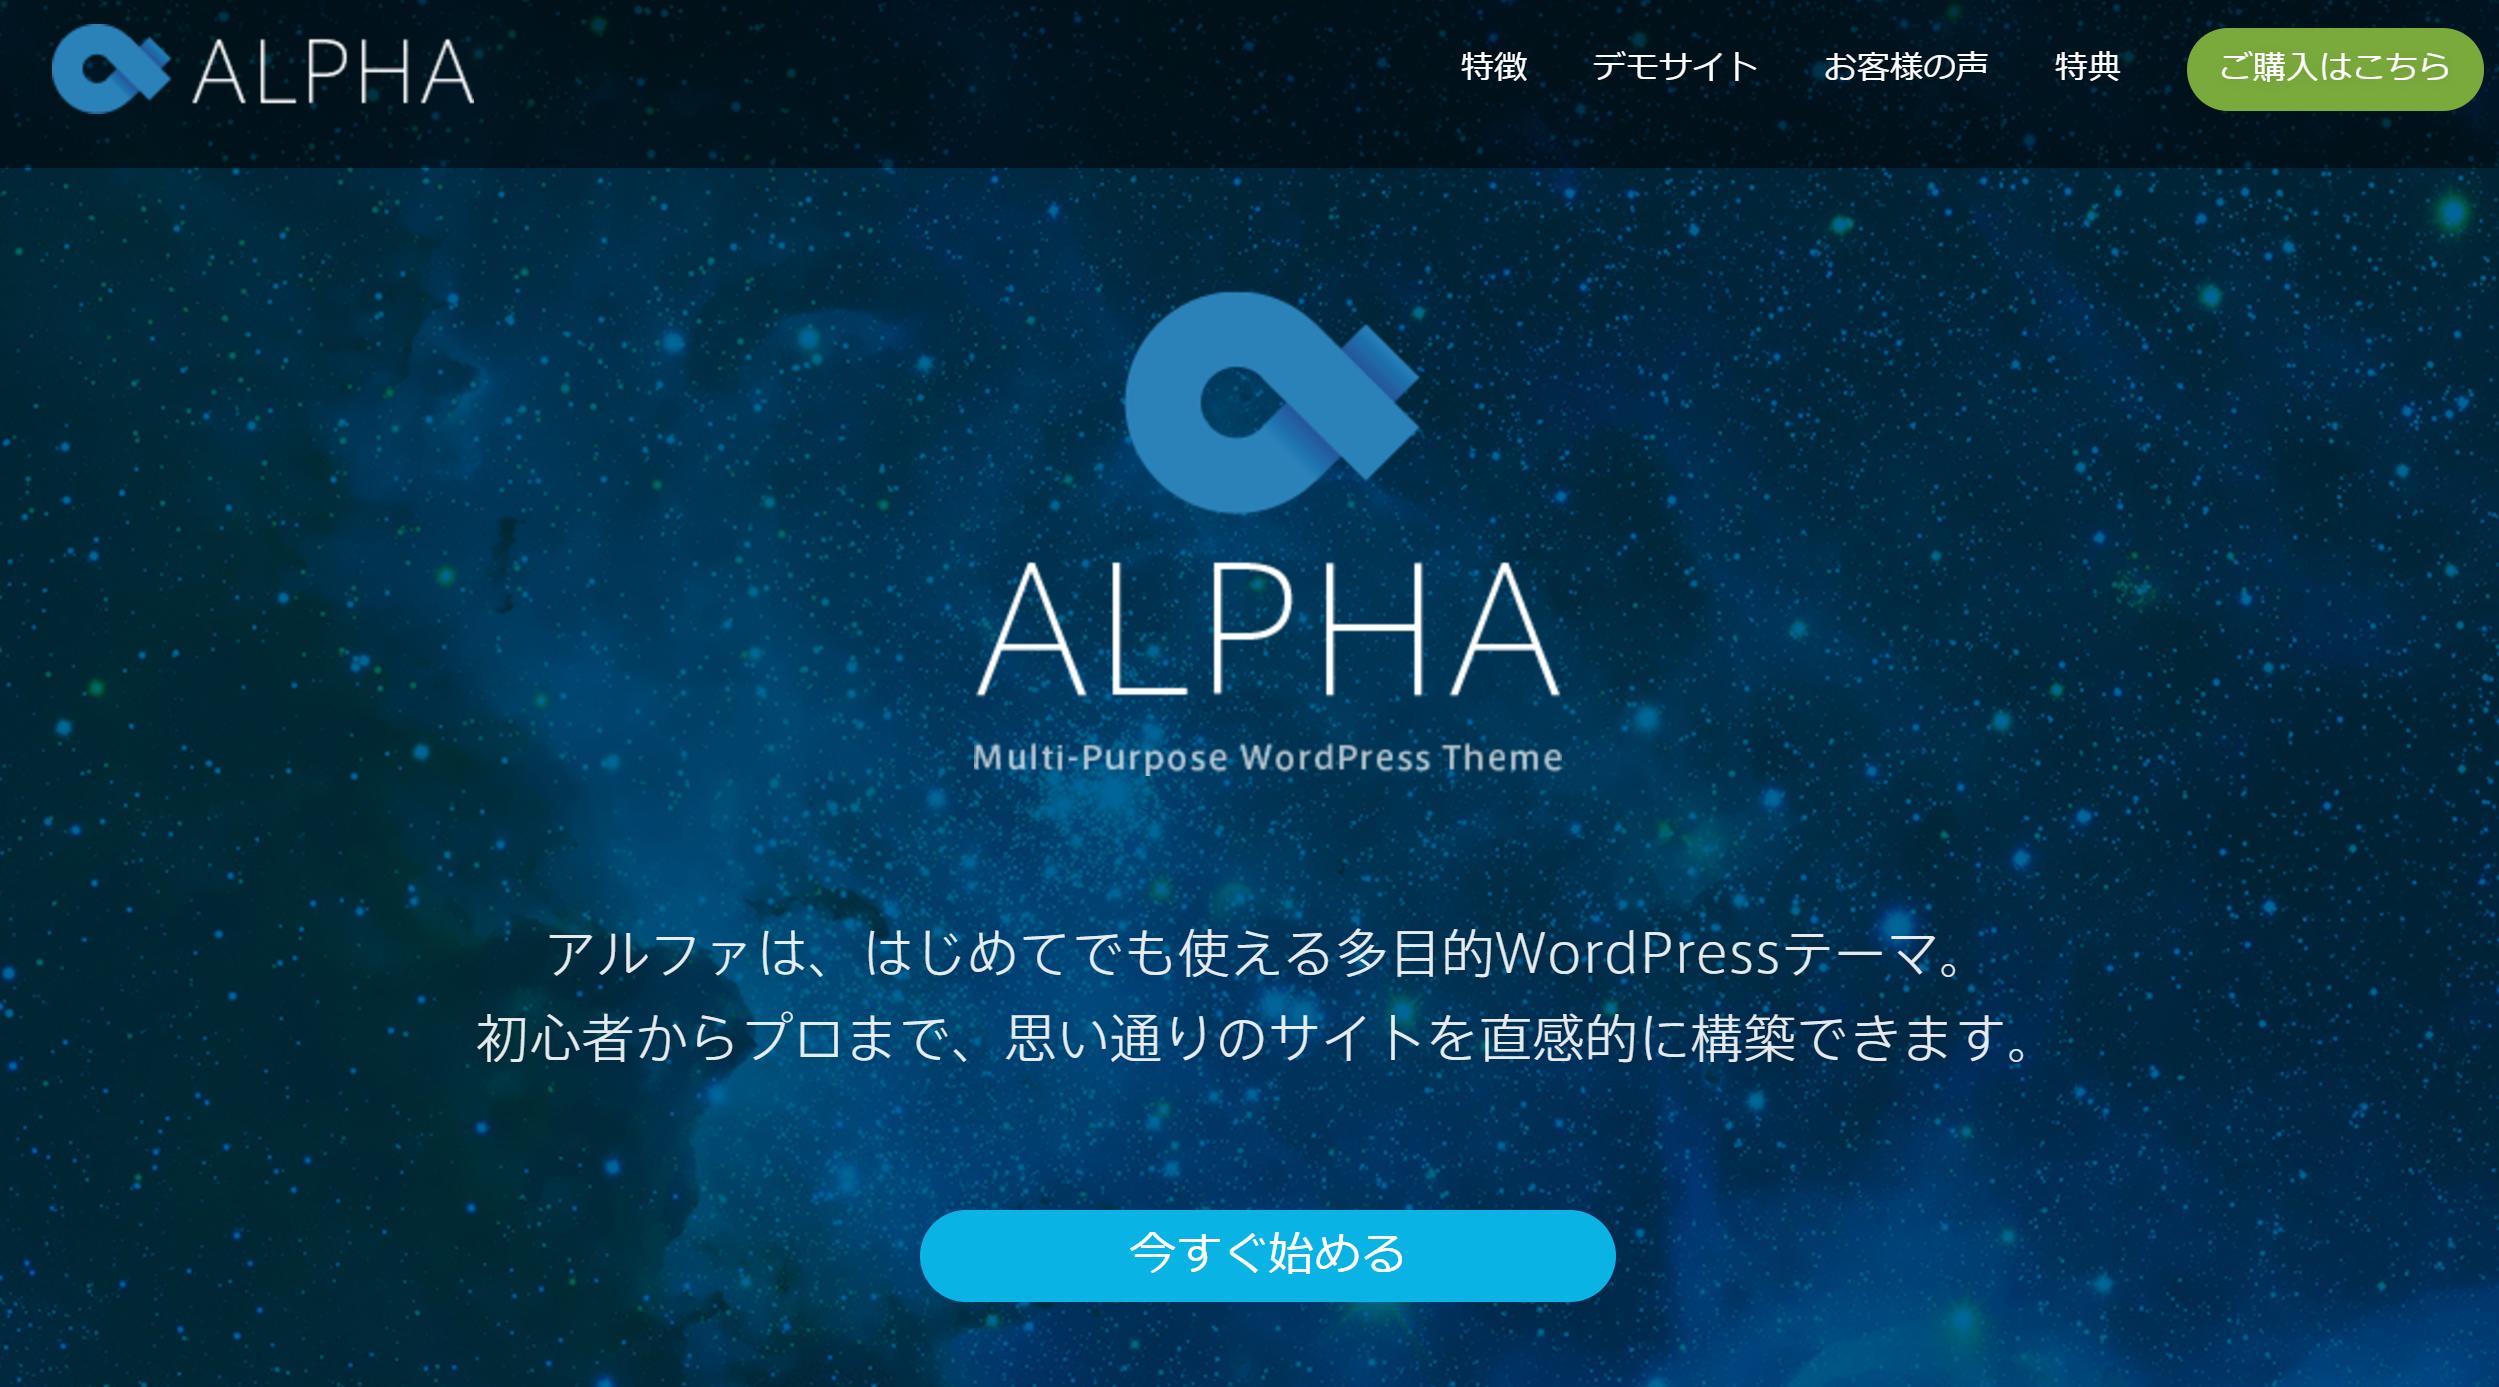 alpha - WordPressの有料テーマを使うメリットと初心者におすすめ15選を紹介